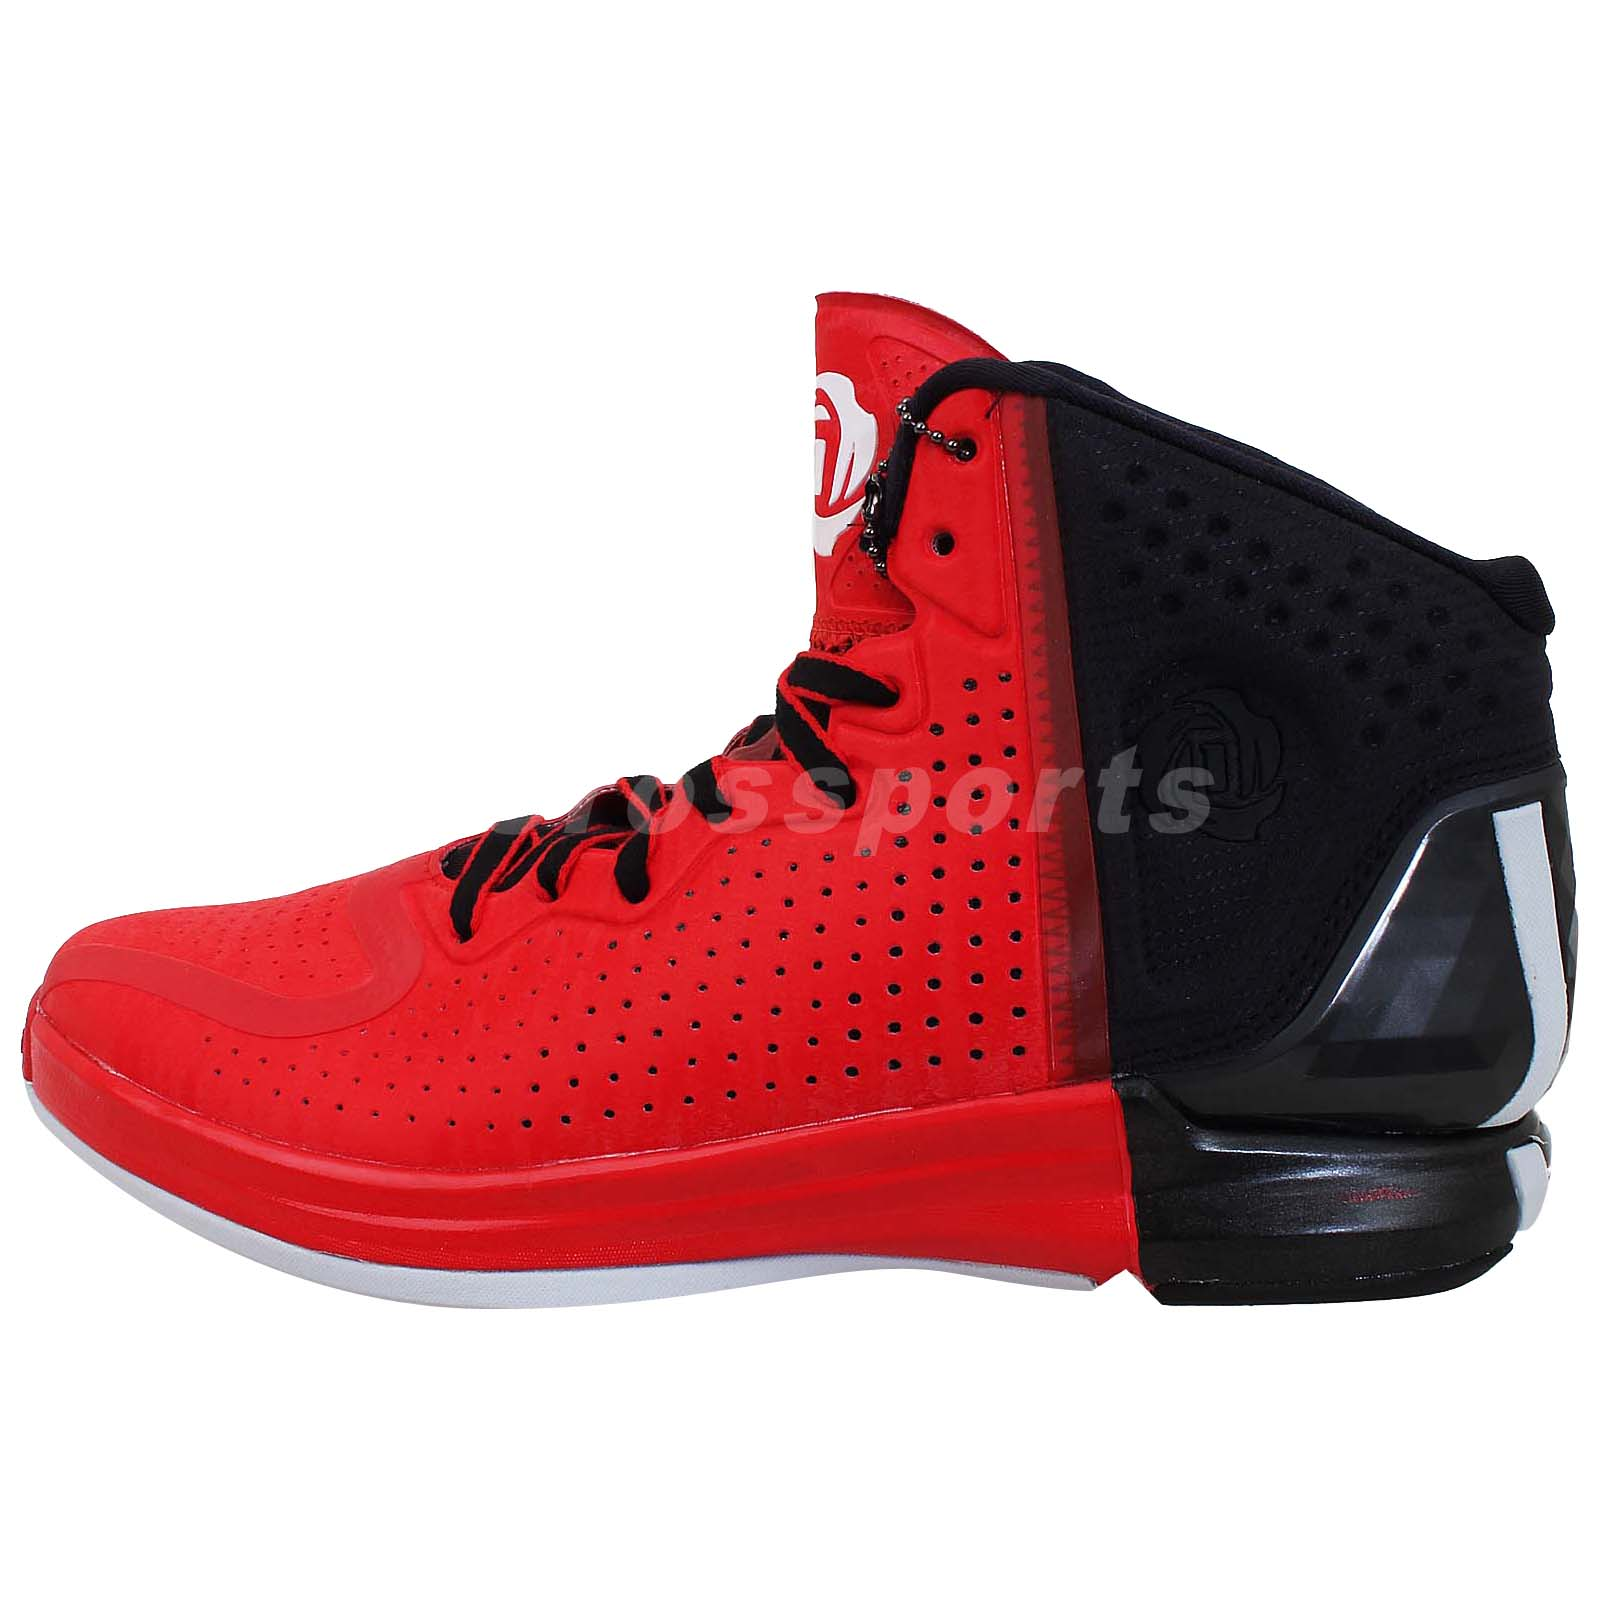 "Adidas D Rose 4 IV Derrick "" Brenda "" RED Black Bulls 2013 ..."